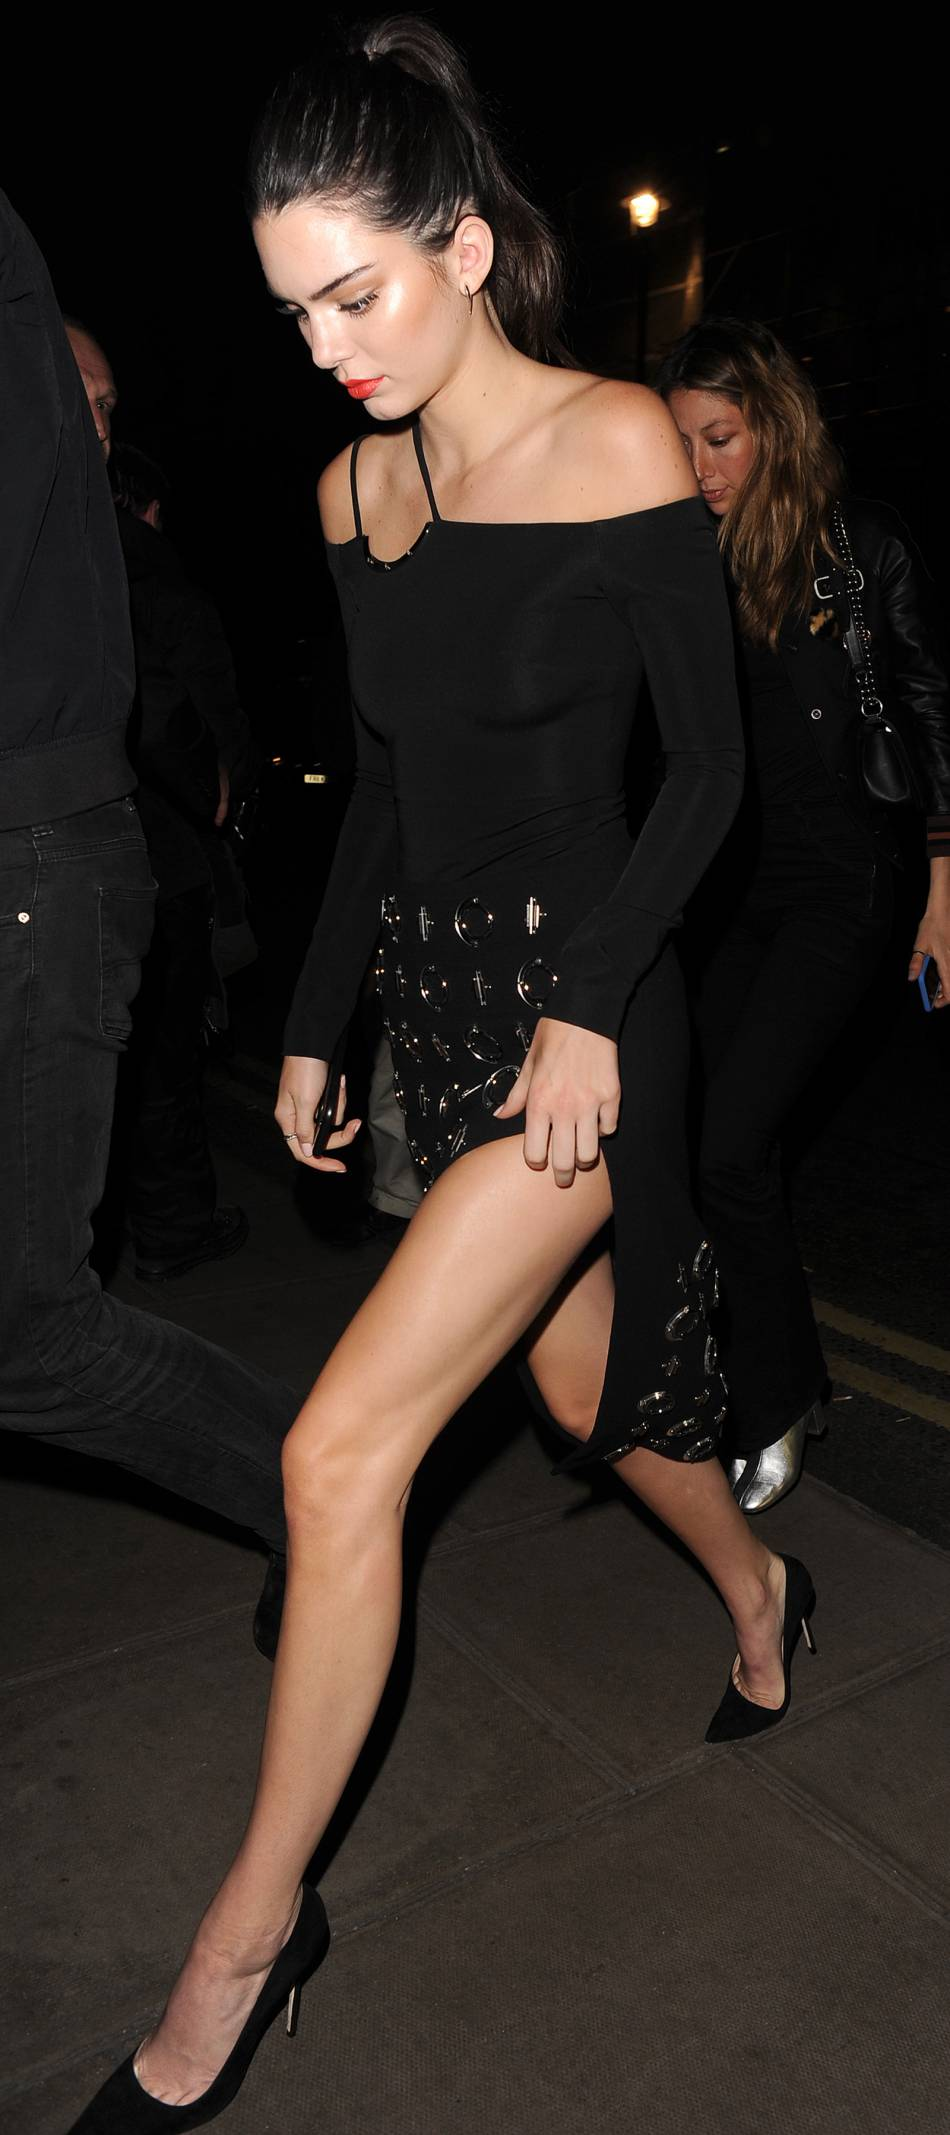 Kendall Jenner apparaît glamour avec sa bouche habillée de rouge.